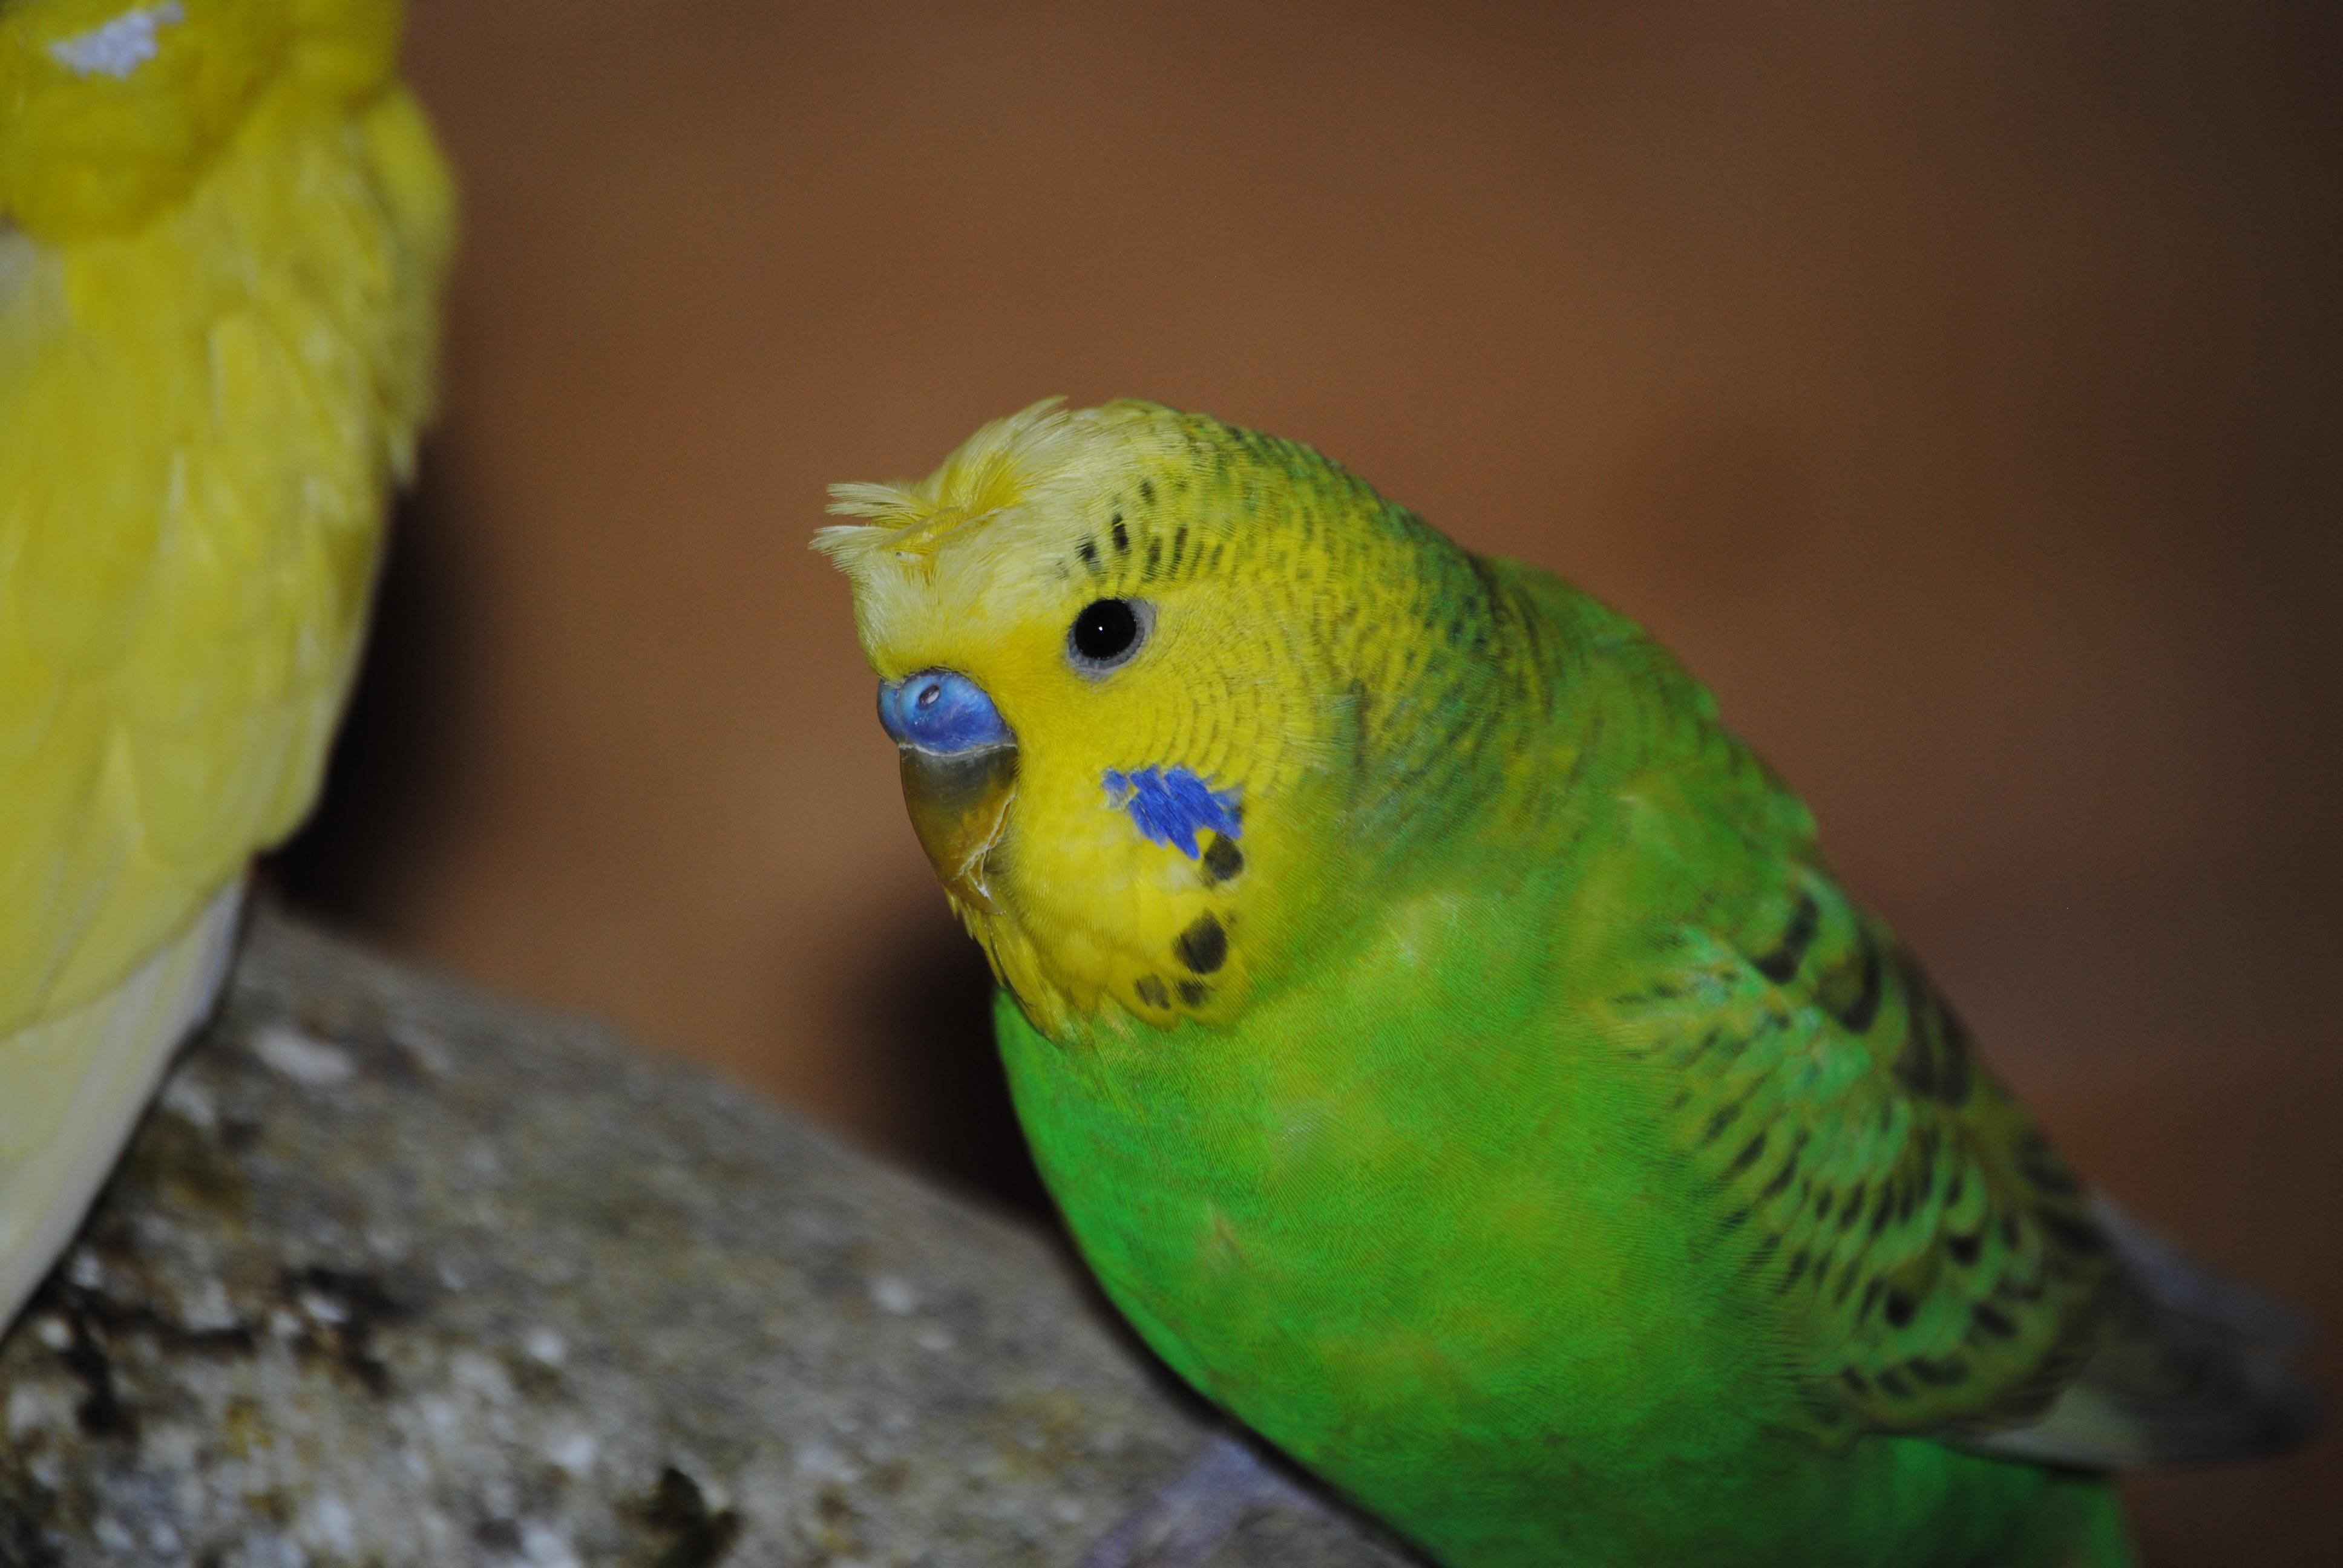 Perruche ondulee oiseaux daily geek show - Dessin perruche ...